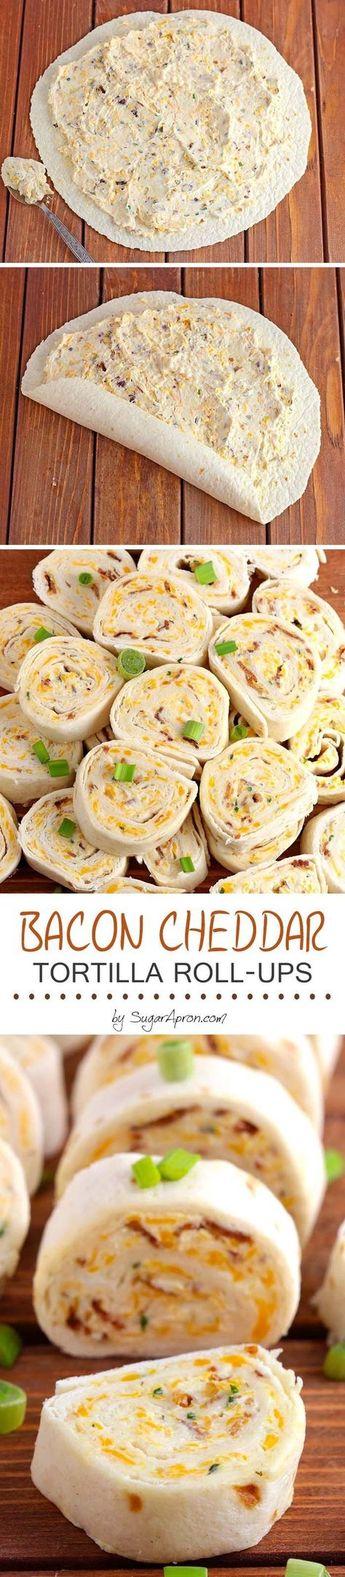 Bacon Cheddar Tortilla Roll Ups